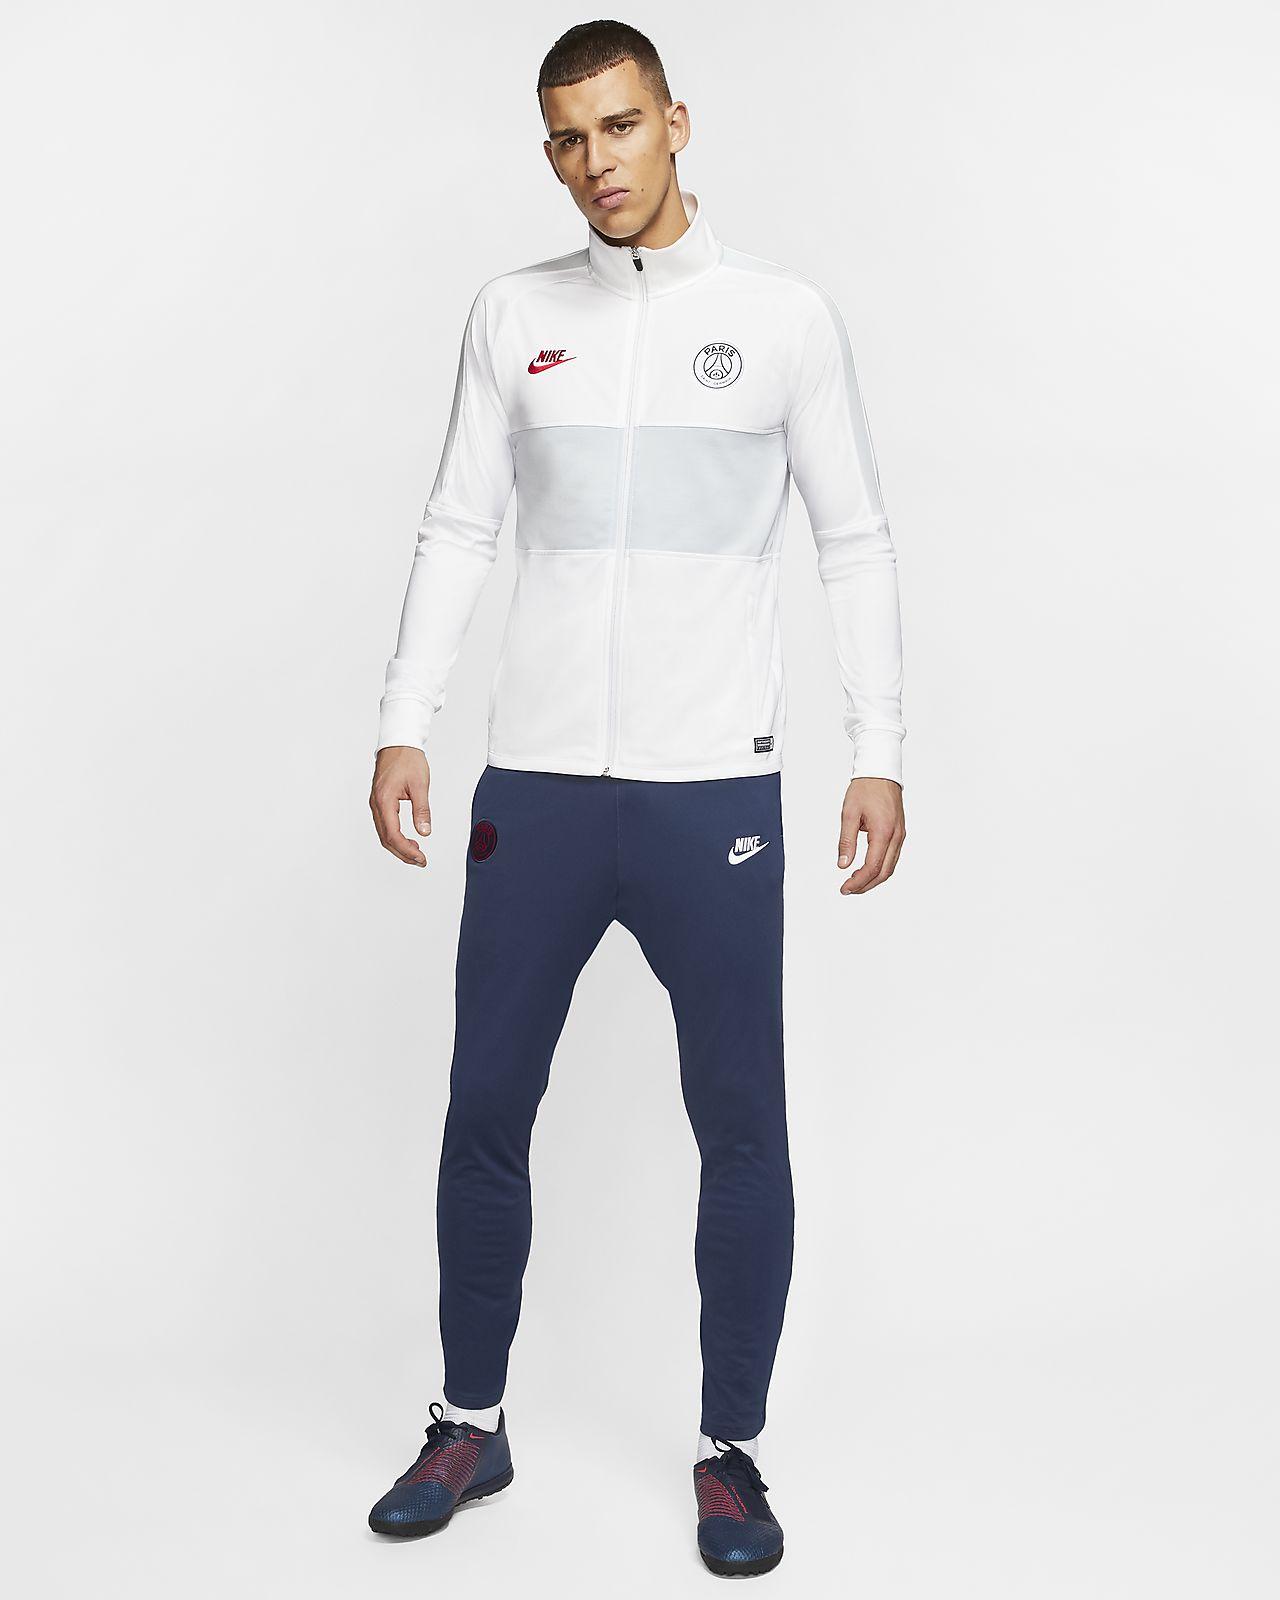 Fotbollstracksuit Nike Dri-FIT Paris Saint-Germain Strike för män